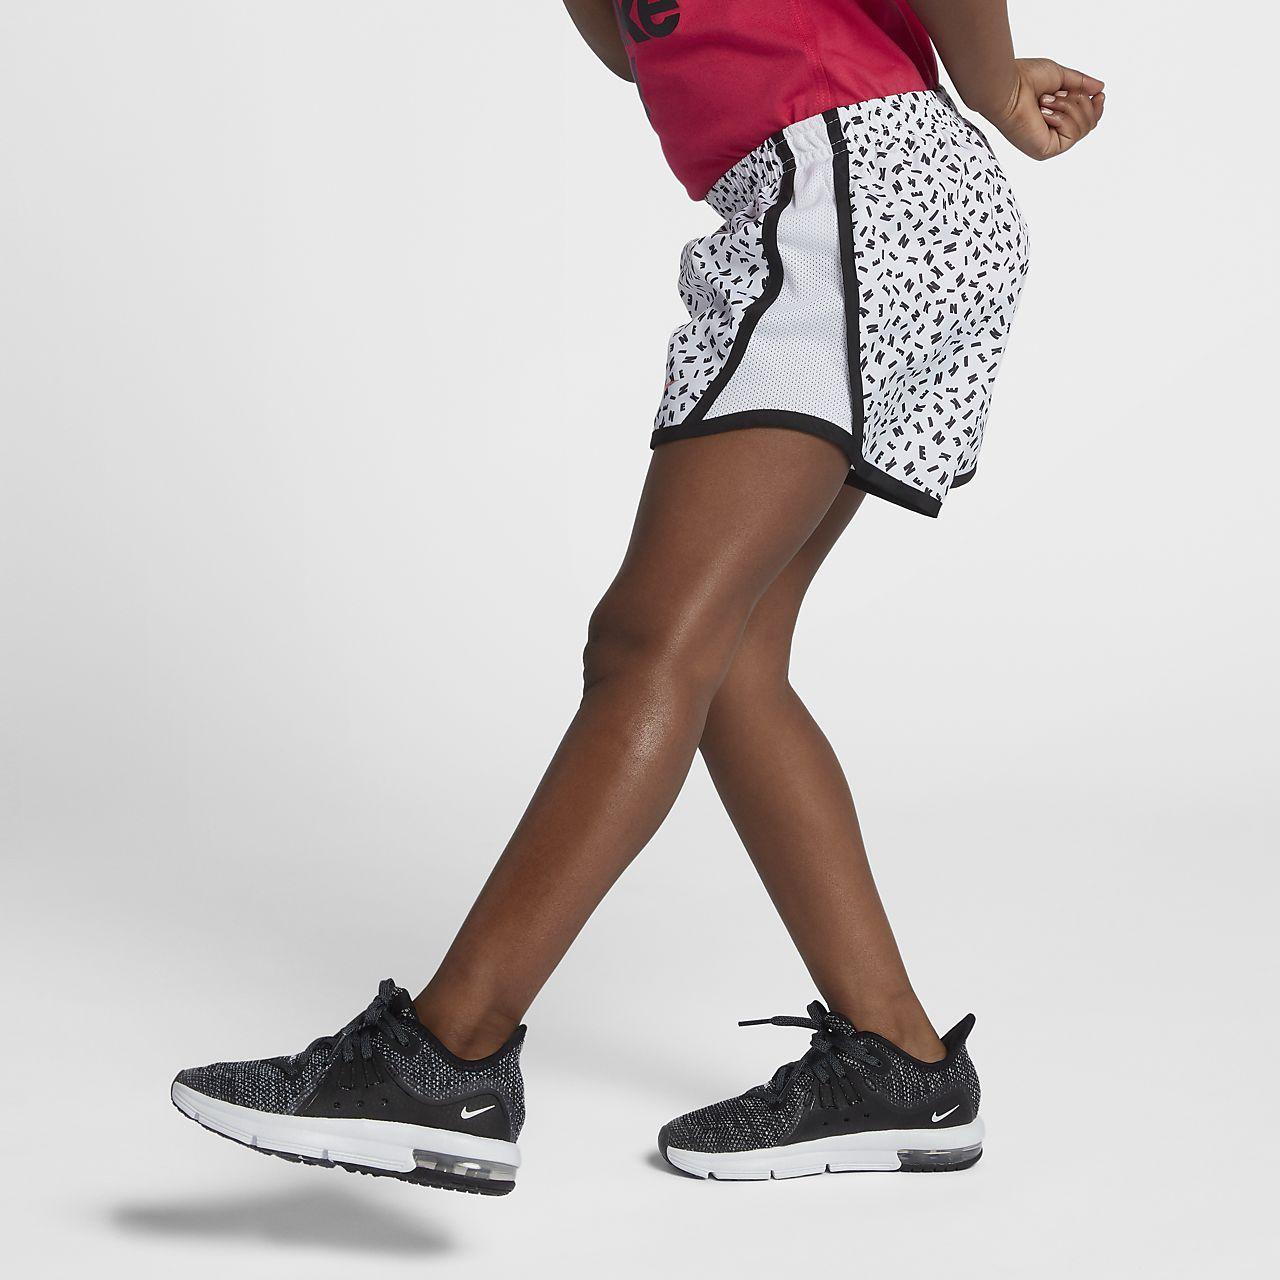 26a8b18f8b Nike Dri-FIT Tempo Little Kids' (Girls') Printed Shorts. Nike.com